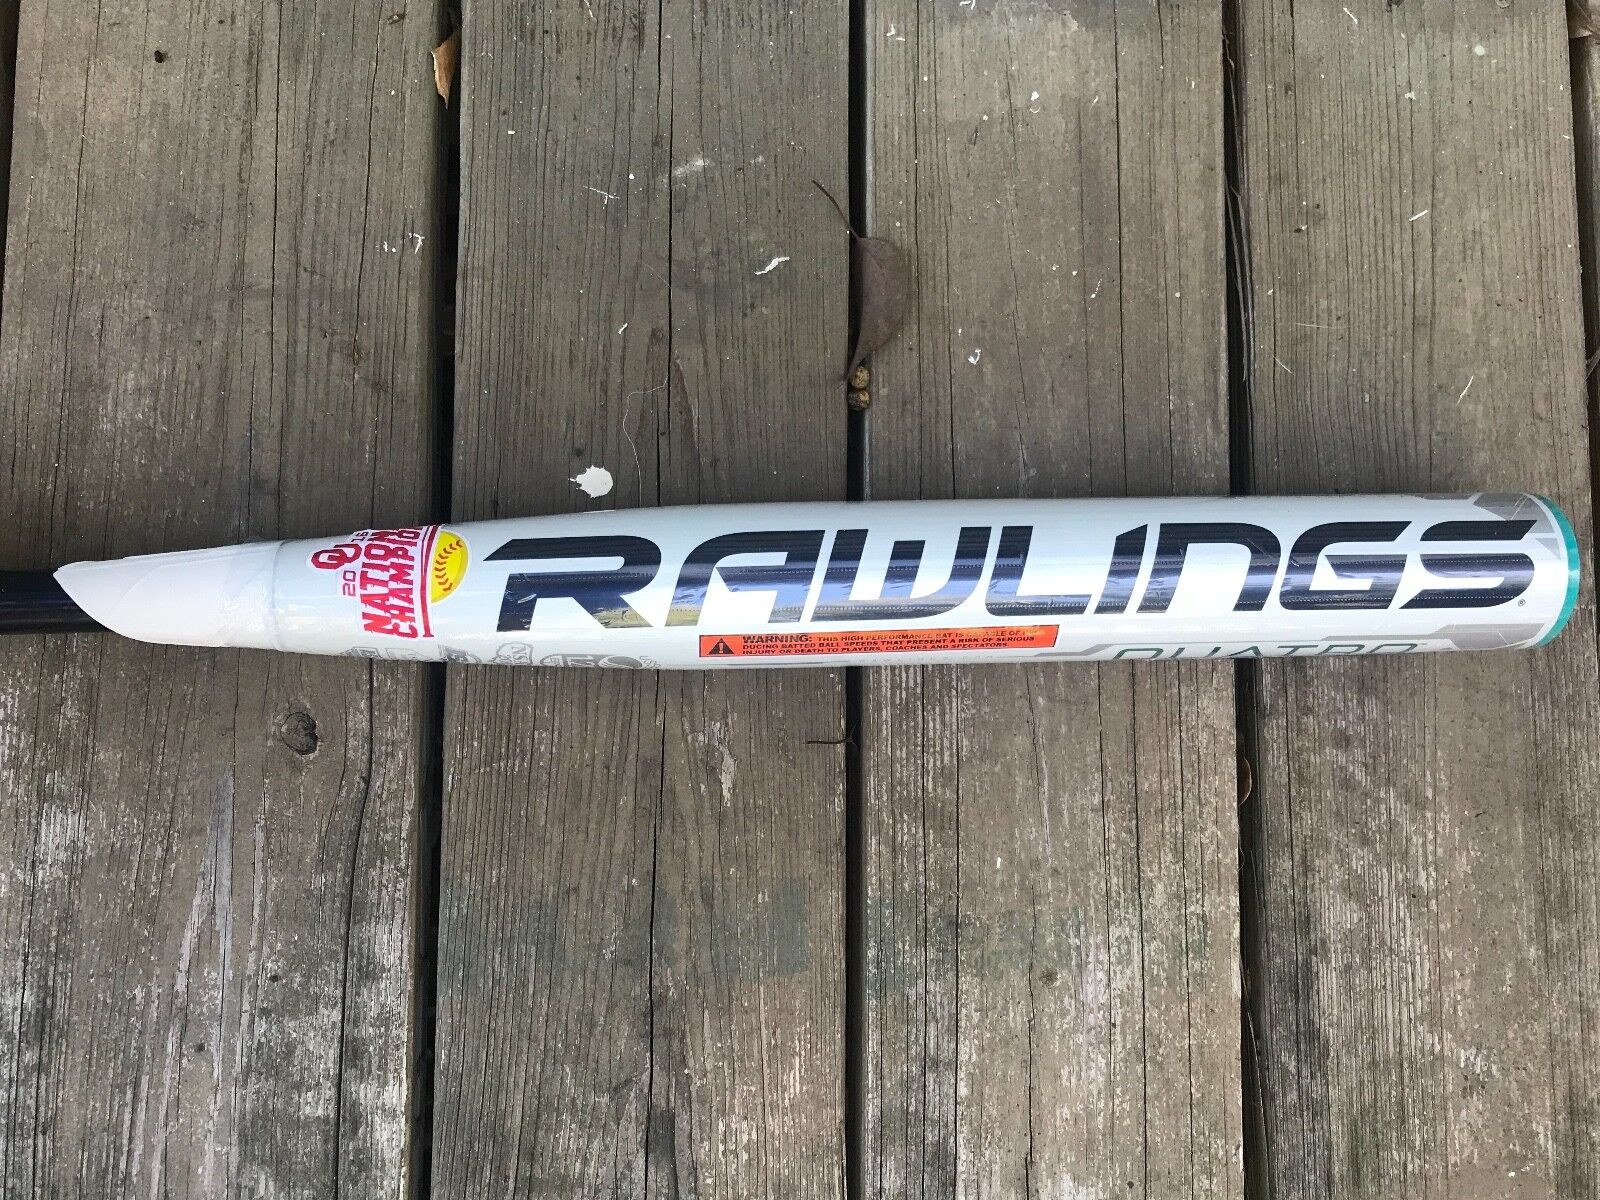 Rawlings Softbol bate Quatro -10 Talla 33 23 totalmente NUEVO En Envoltura